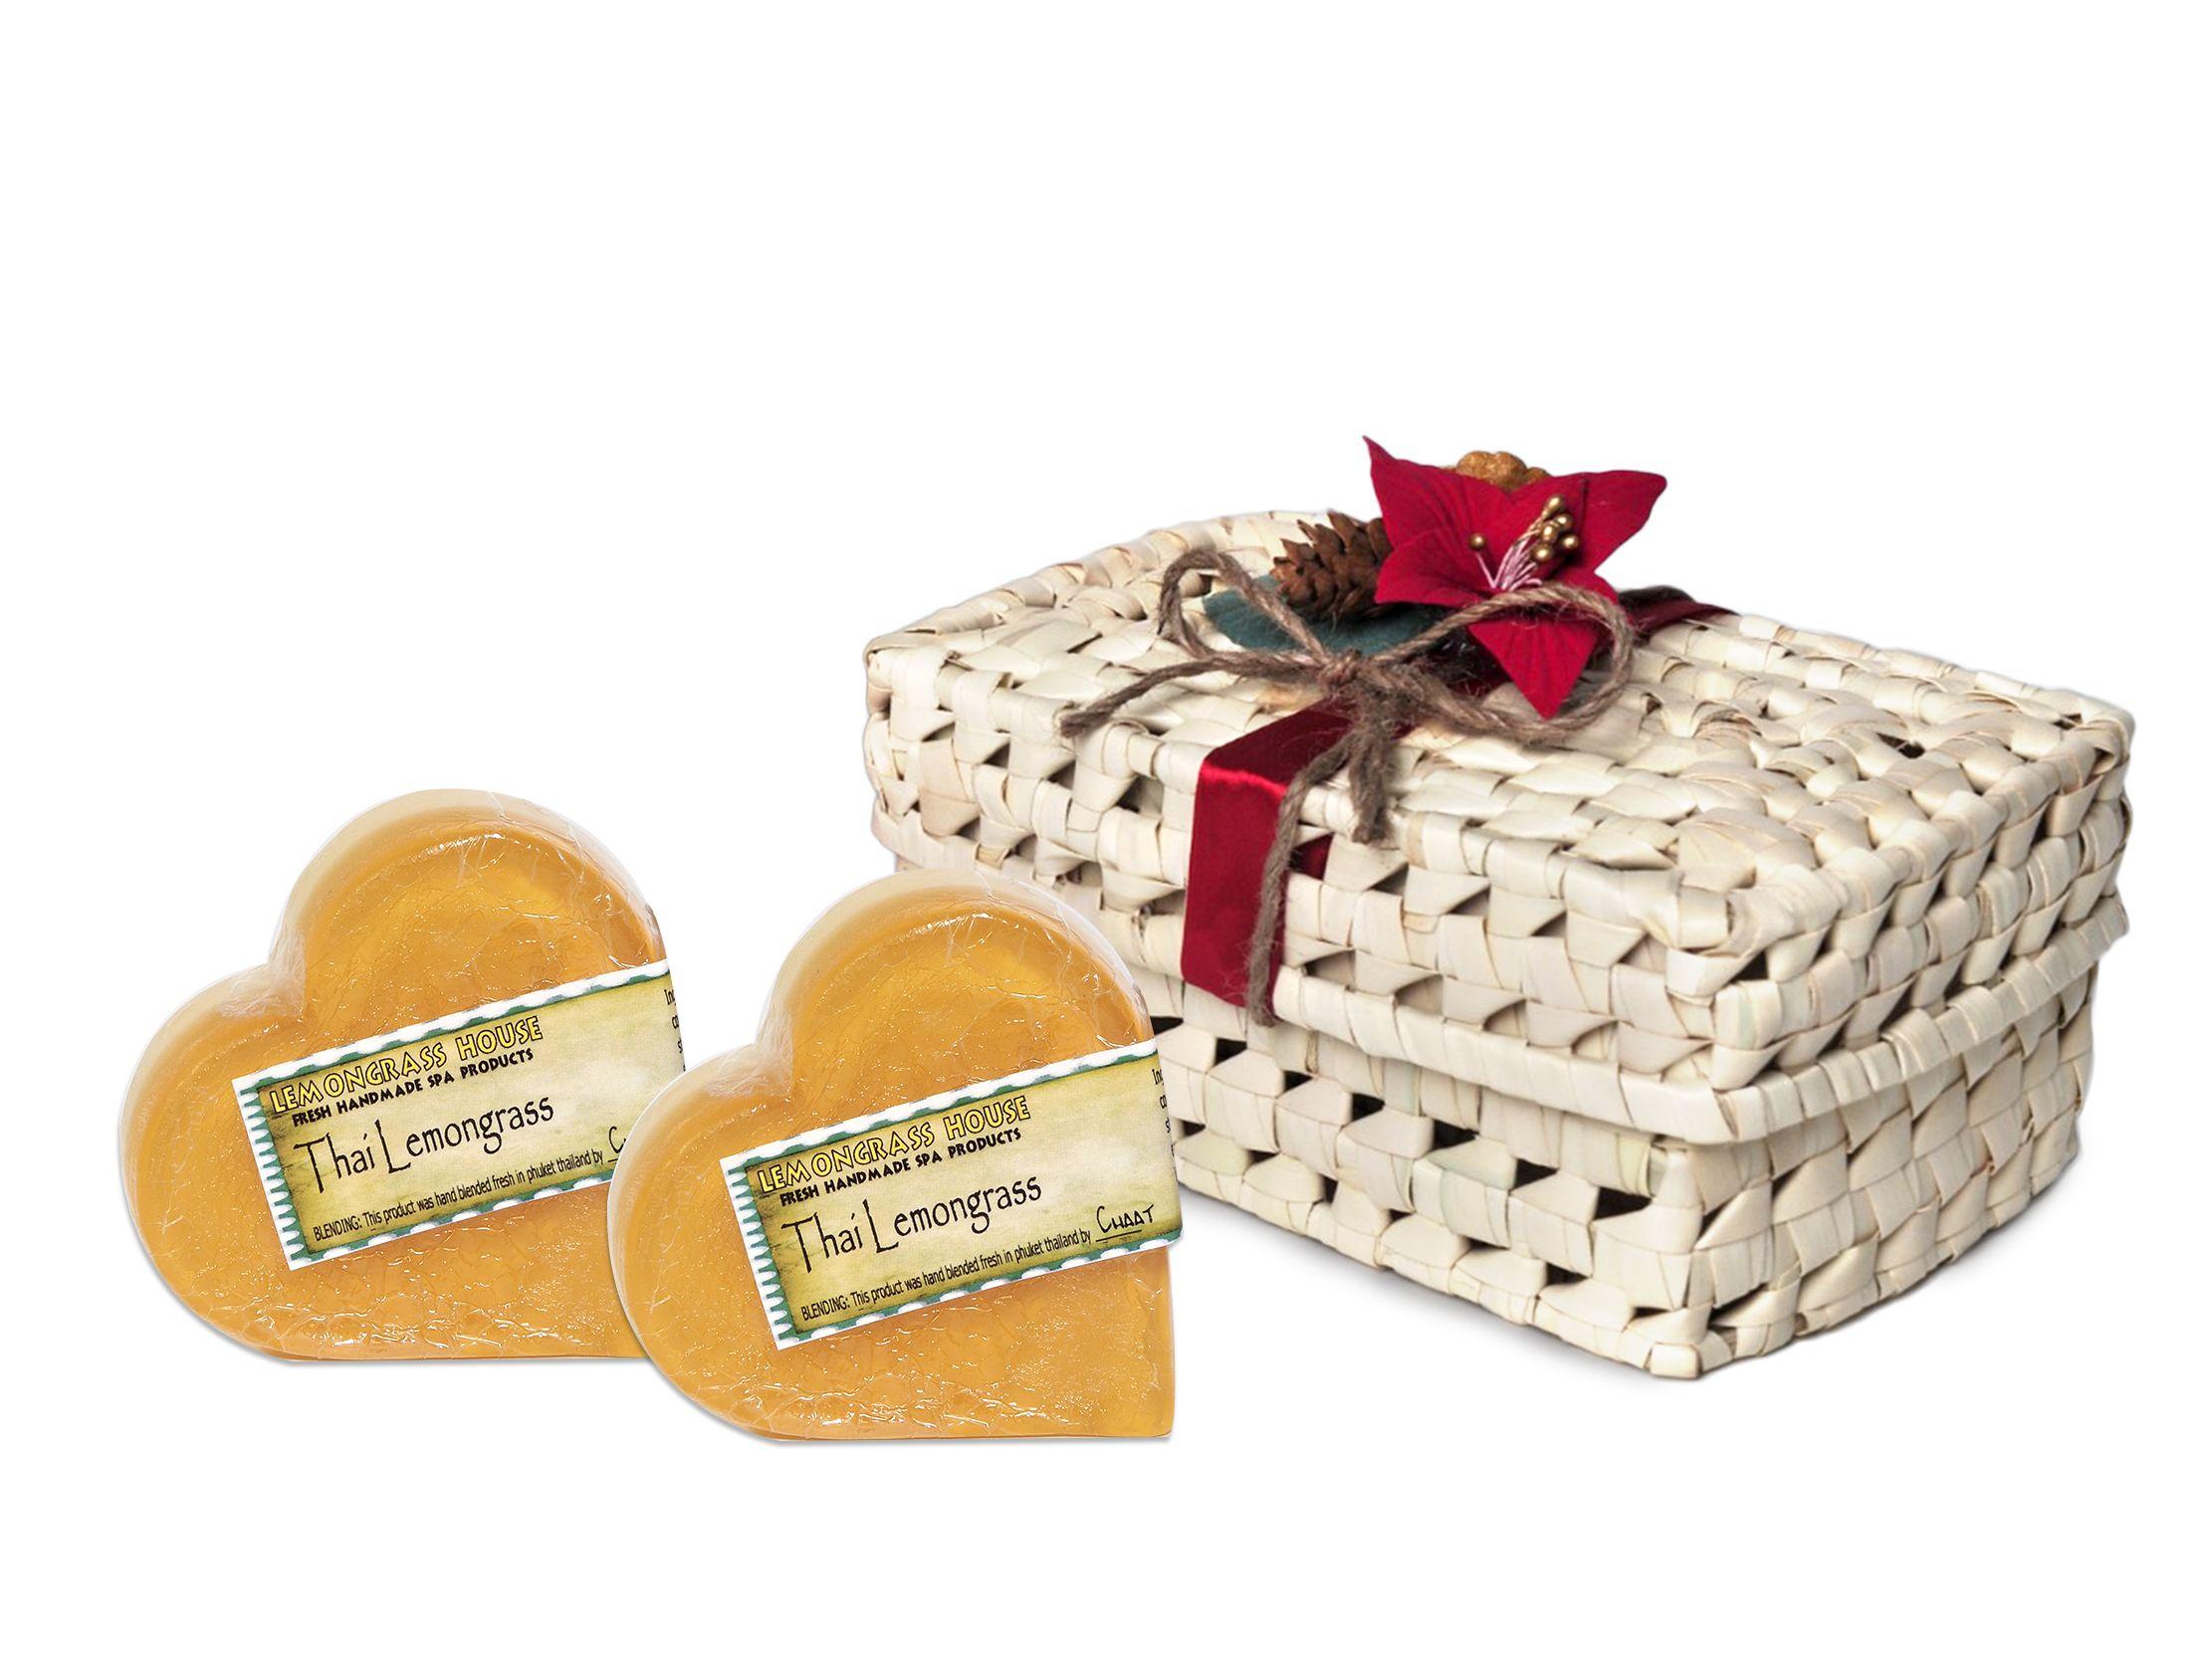 This Christmas gift set includes Two Thai Lemongrass